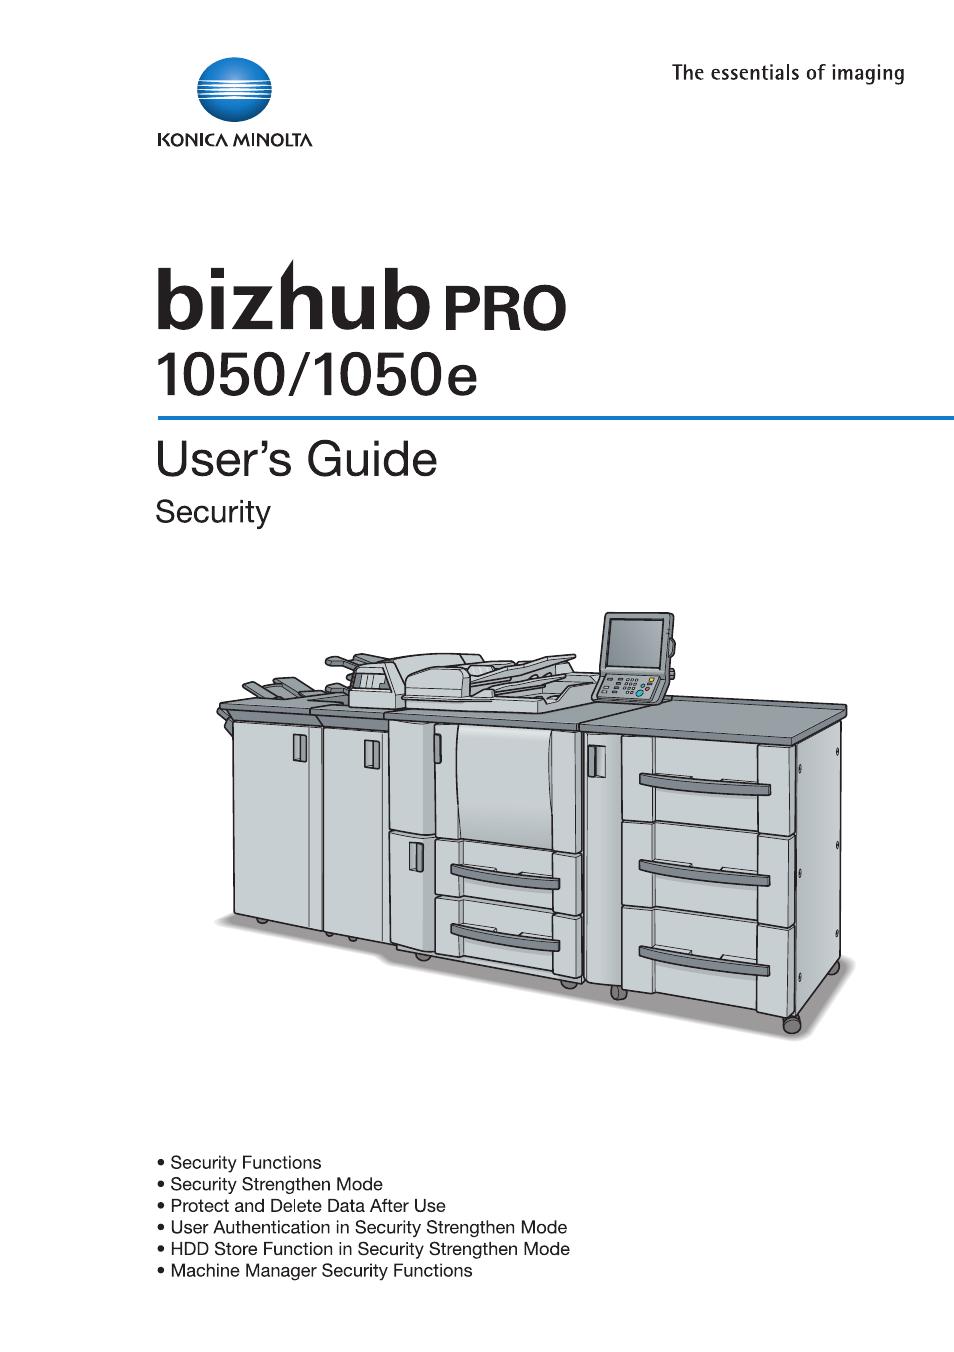 Konica Minolta BIZHUB PRO 1050 User Manual   64 pages   Also for: BIZHUB  PRO 1050E